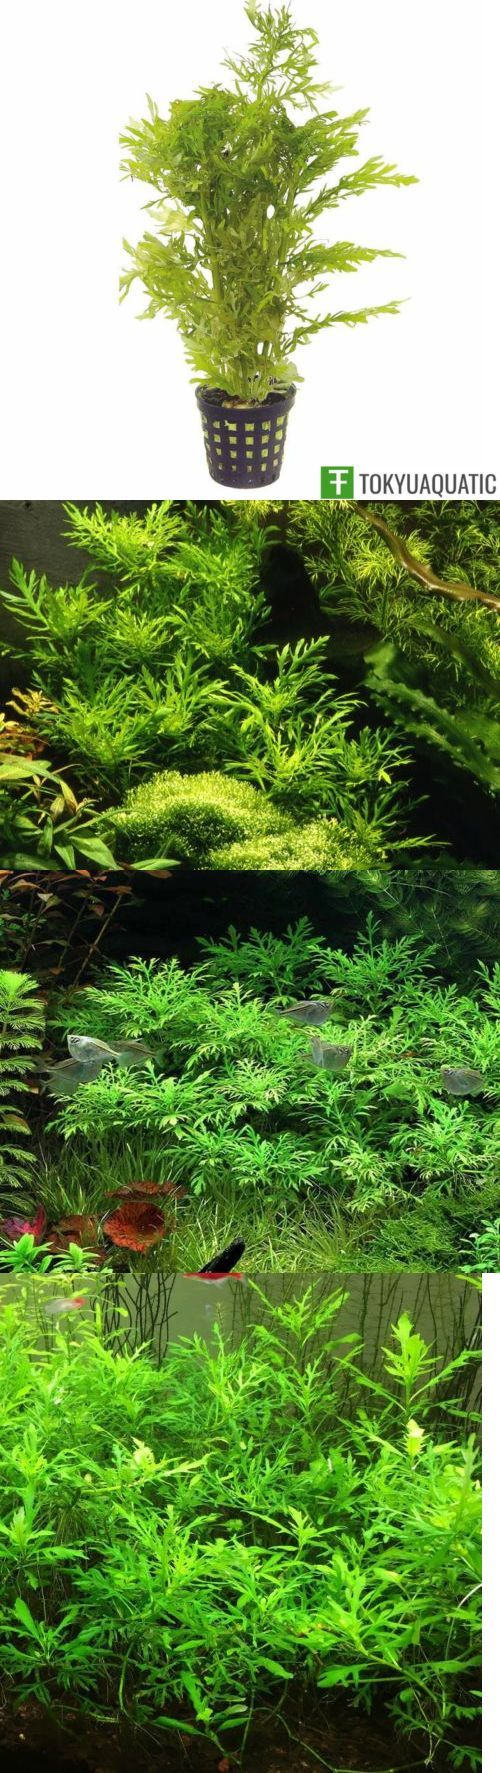 Live plants hygrophila difformis water wisteria pot